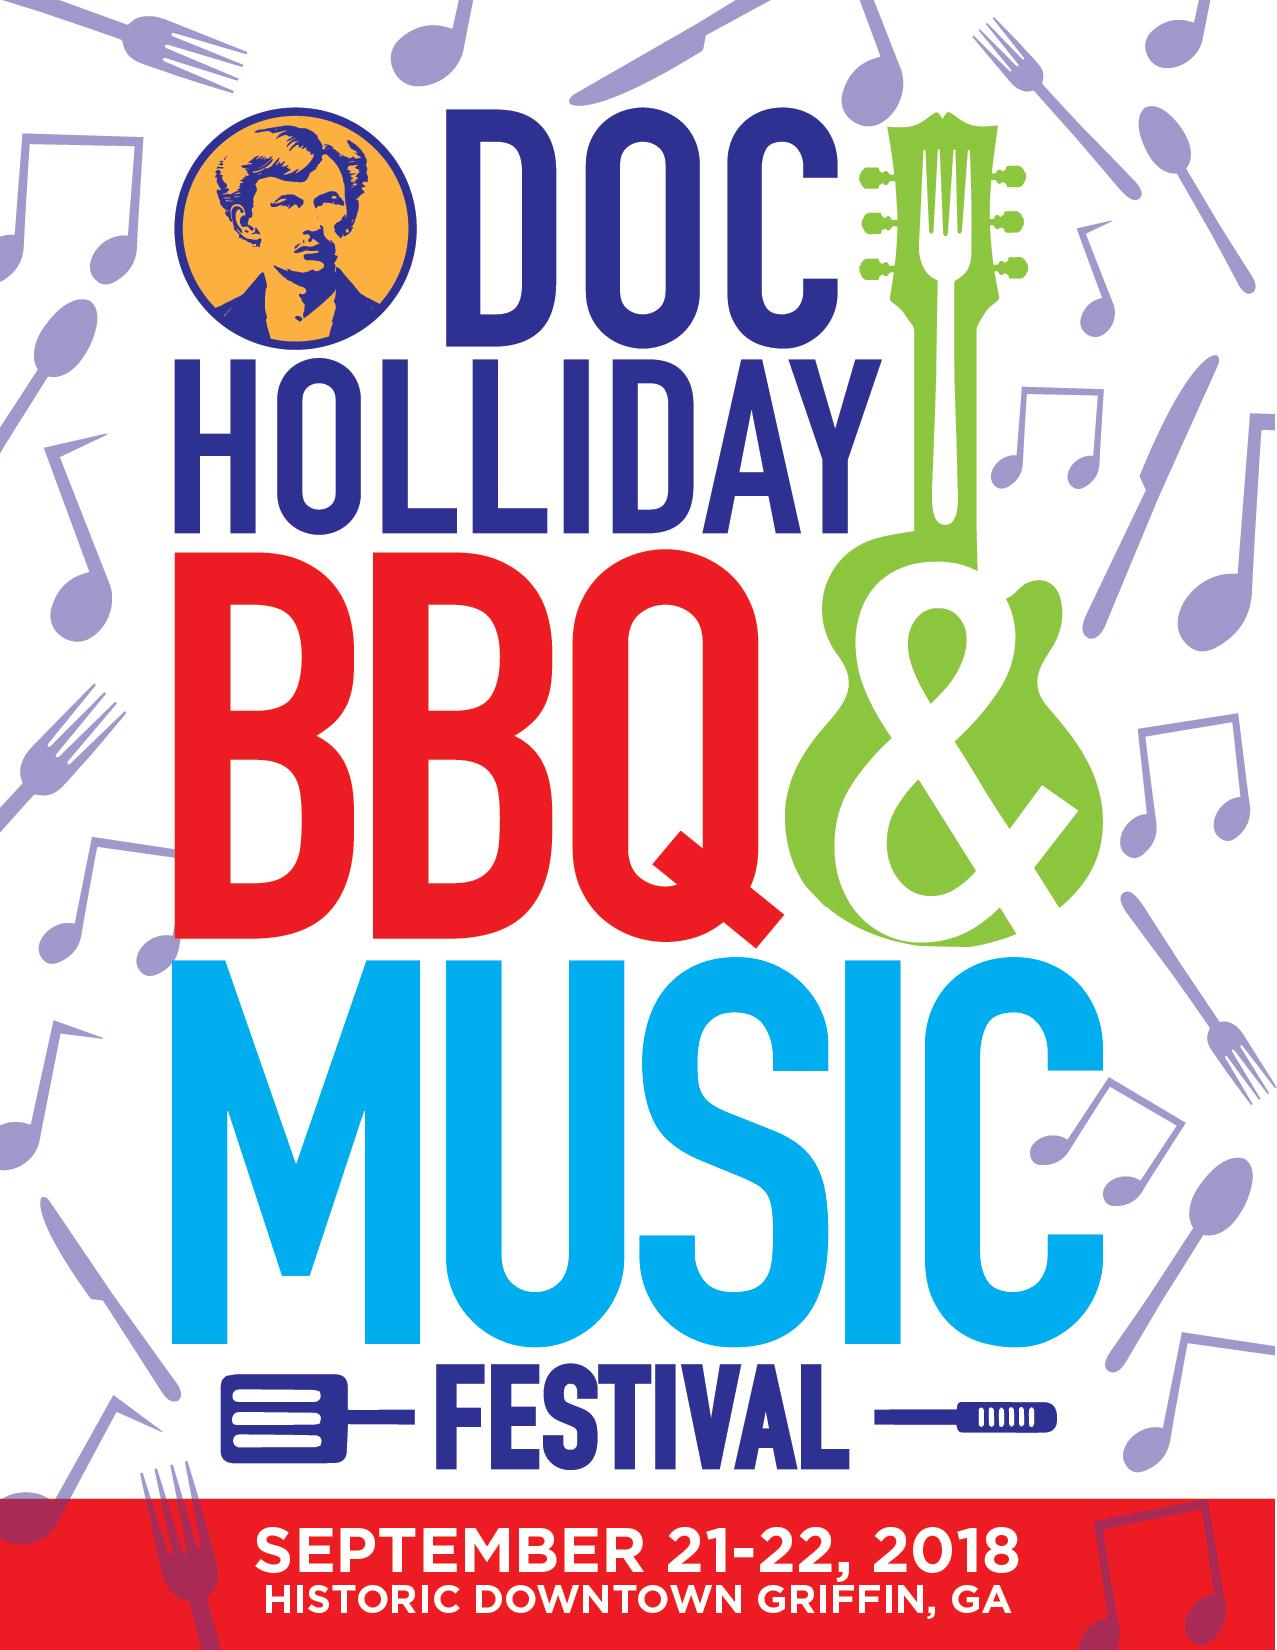 Doc Holliday BBQ